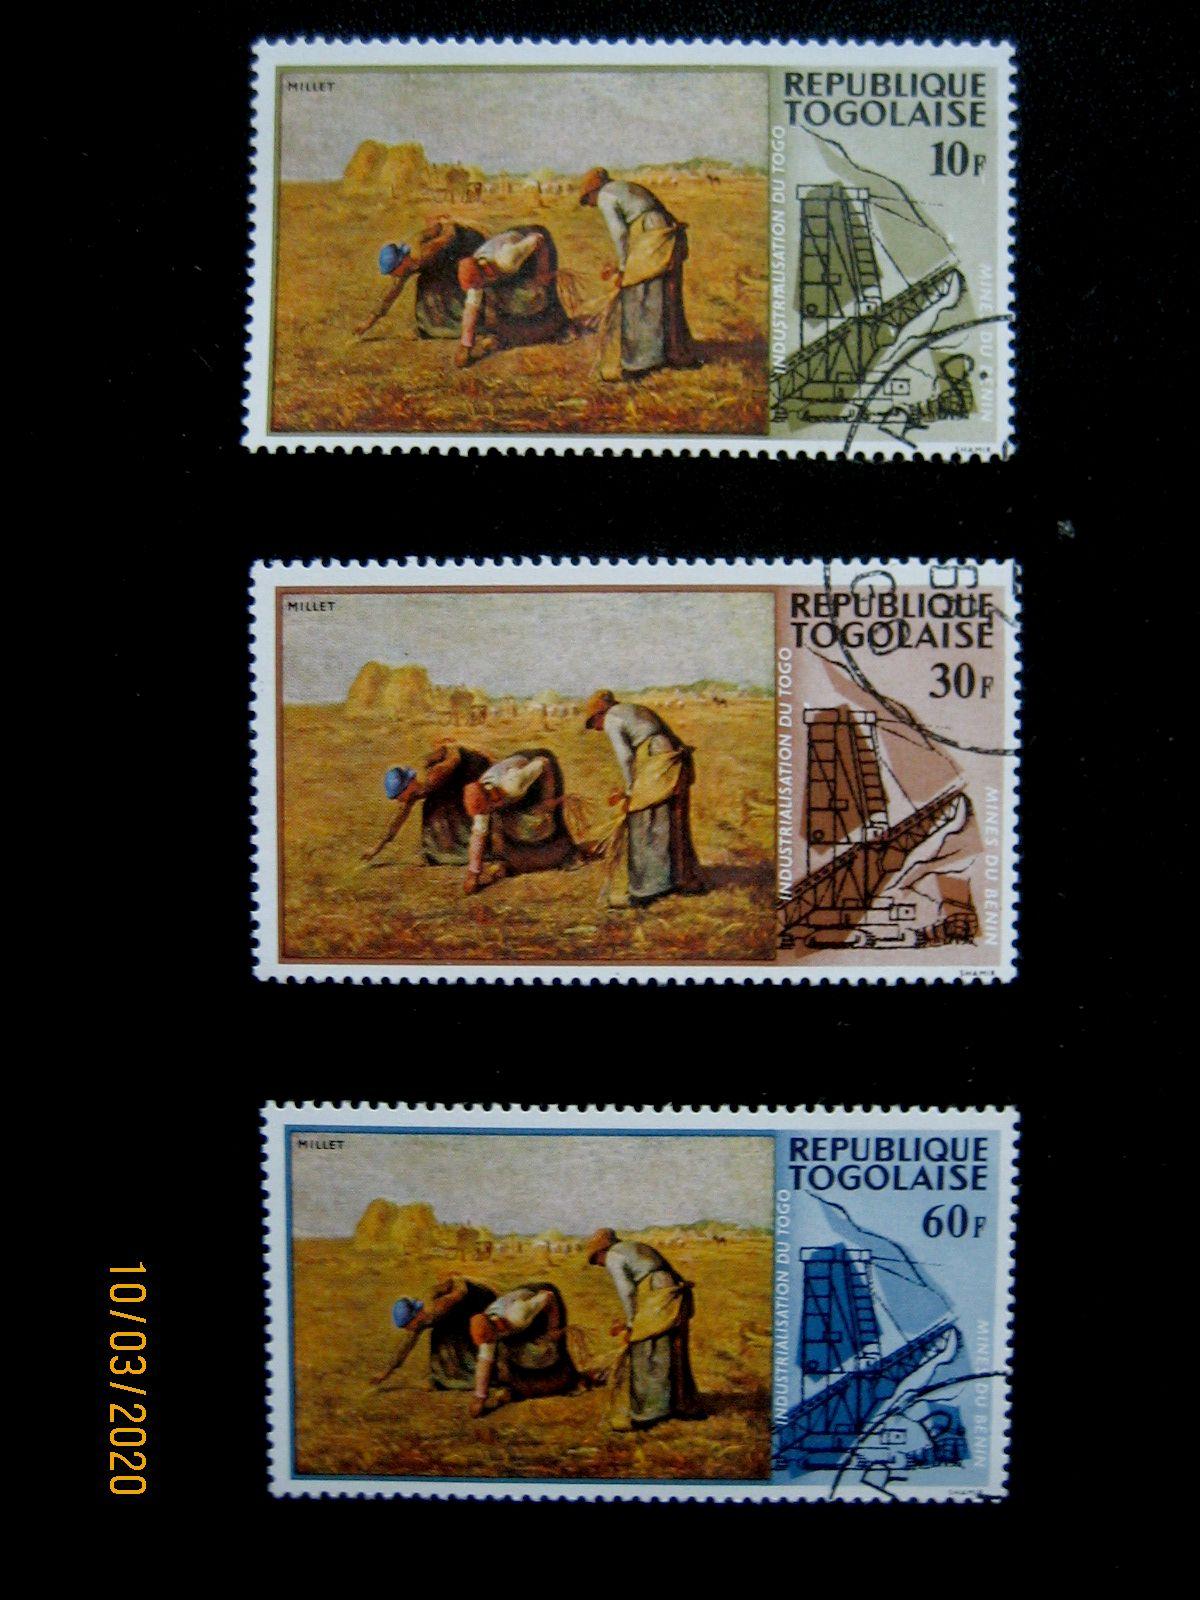 Три марки «Собиратели» Франсуа Милле и Phosperous Works, Номинал — 10 фр. Mi:TG 635, Sn:TG 631, Yt:TG 560 Номинал — 30 фр. Mi:TG 637, Sn:TG 633, Yt:TG 562 Номинал — 60 фр. Mi:TG 639, Sn:TG 635, Yt:TG 564